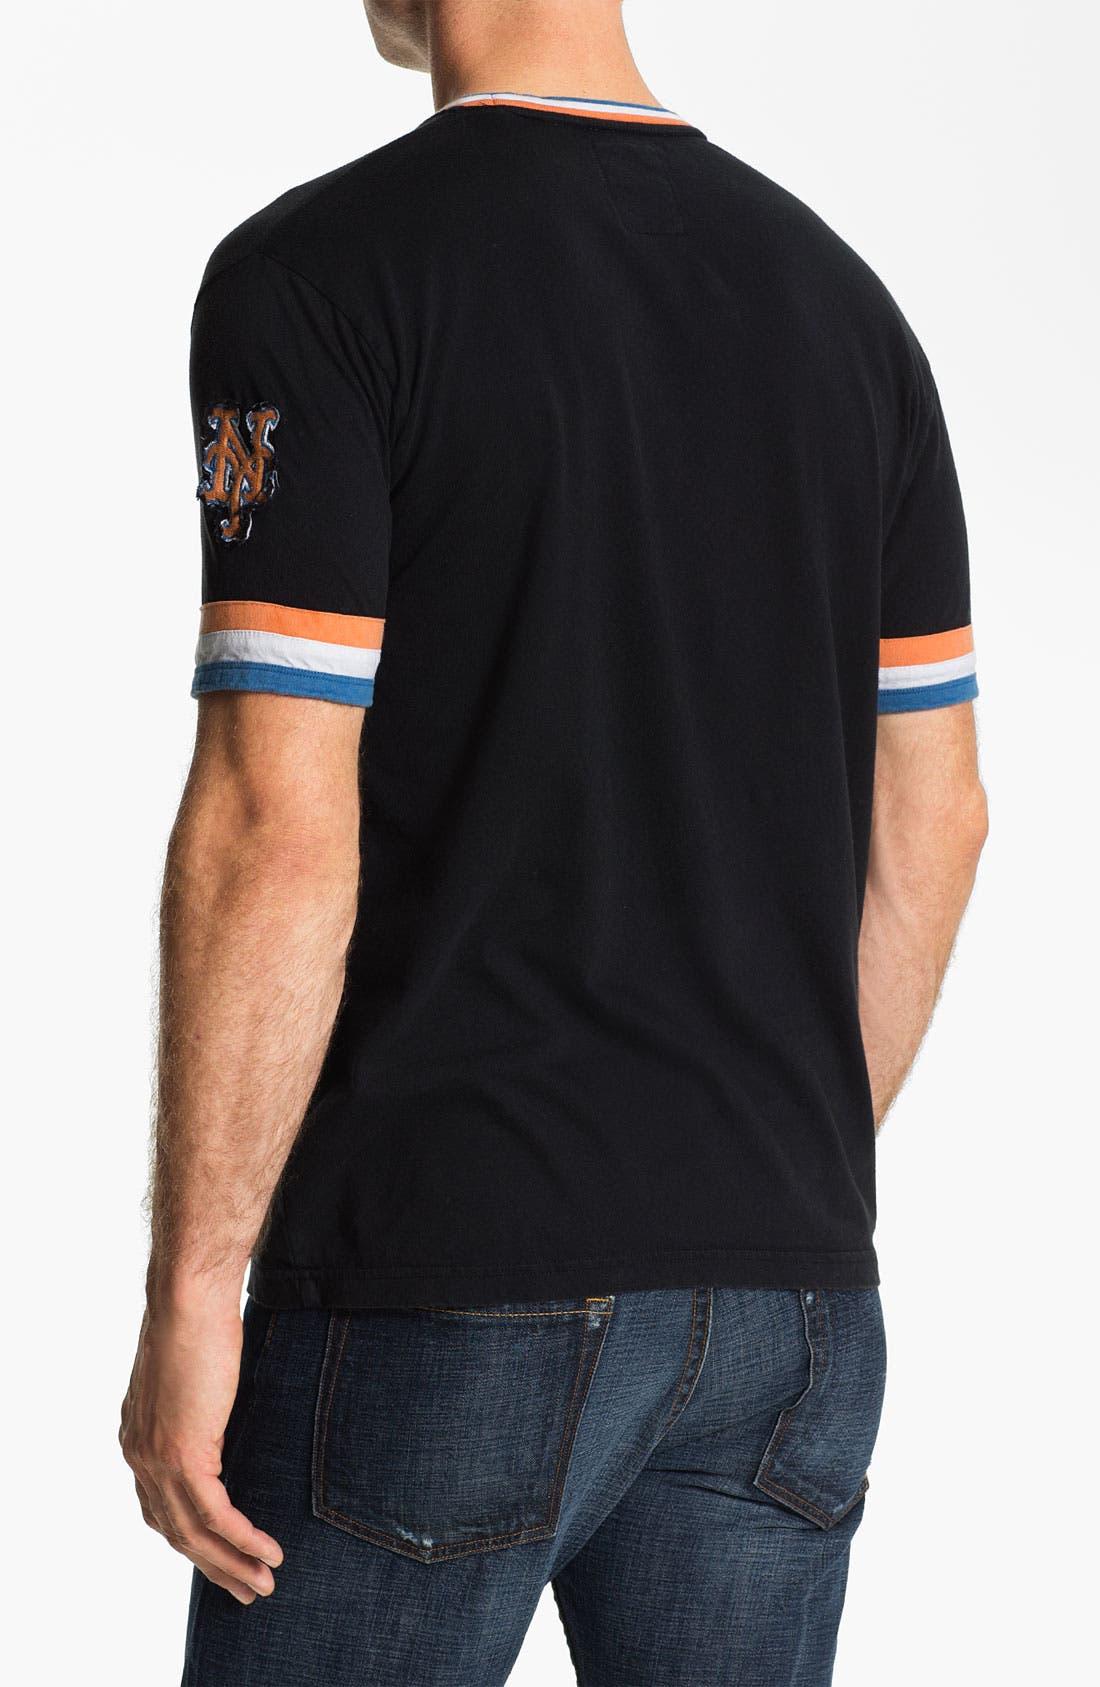 Alternate Image 2  - Red Jacket 'New York Mets' Trim Fit Ringer T-Shirt (Men)